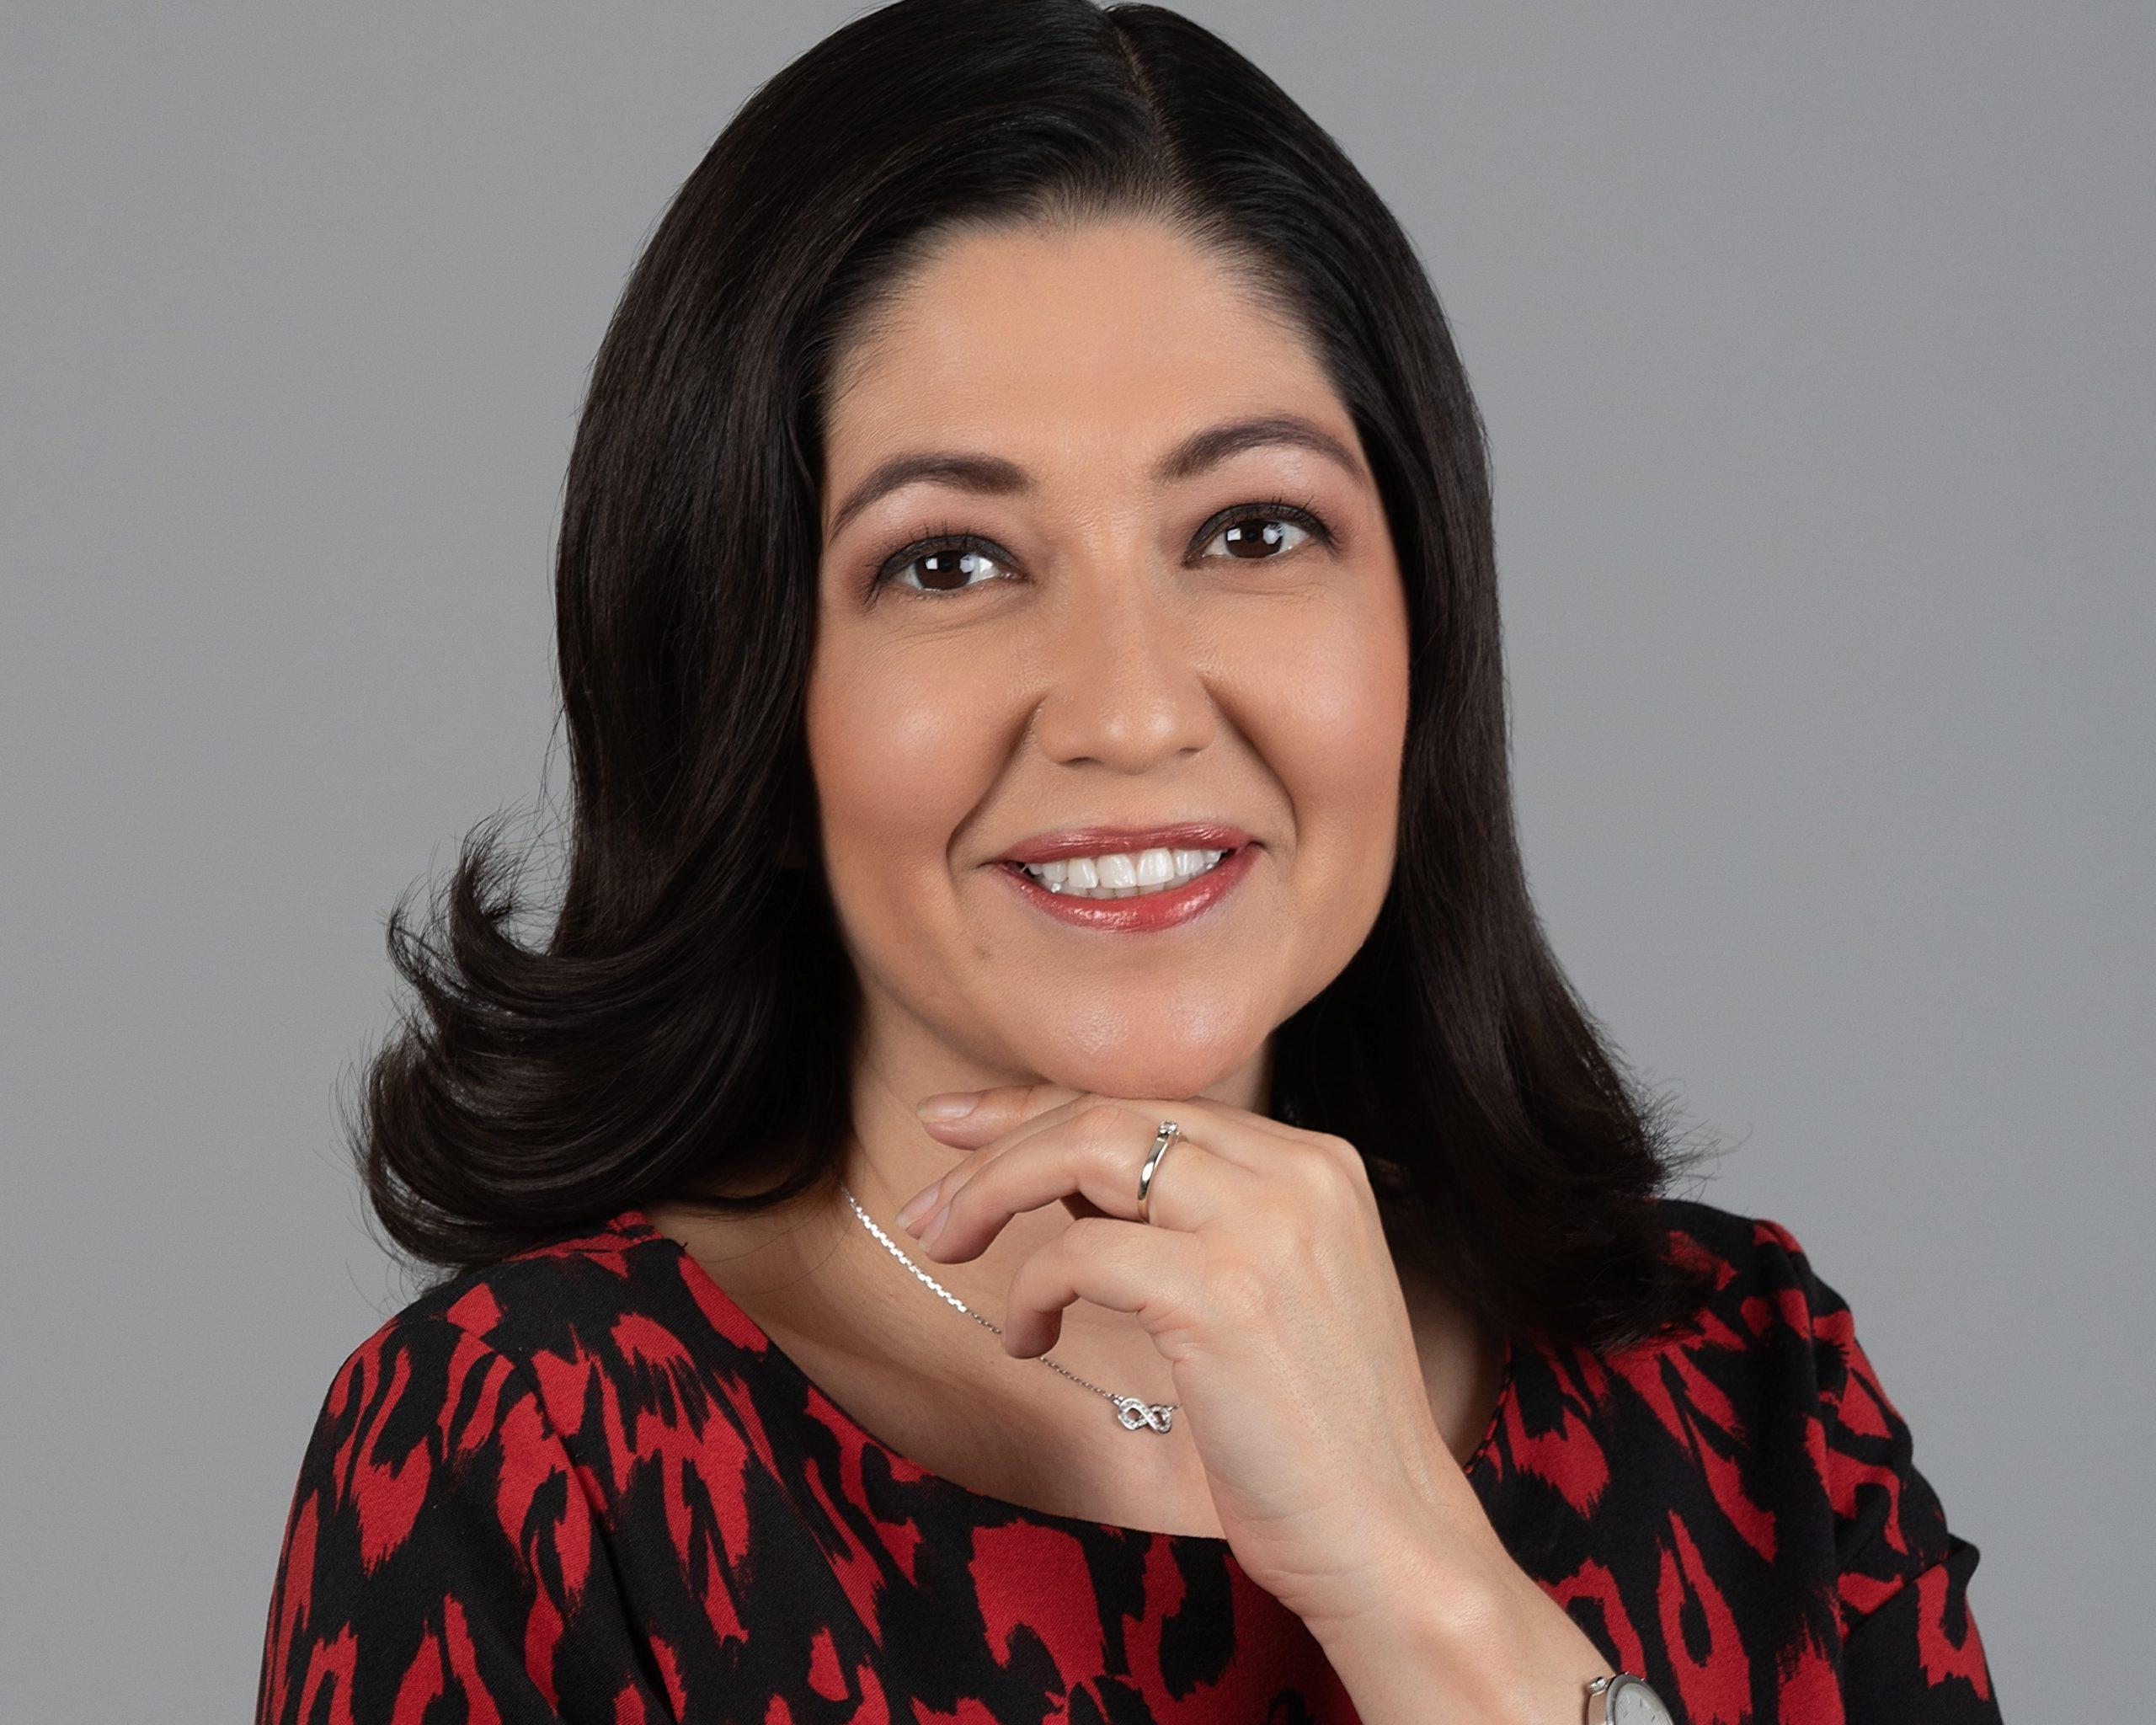 BIO: Erika Quezada Alonso nueva VP de Retail de DHL Express México